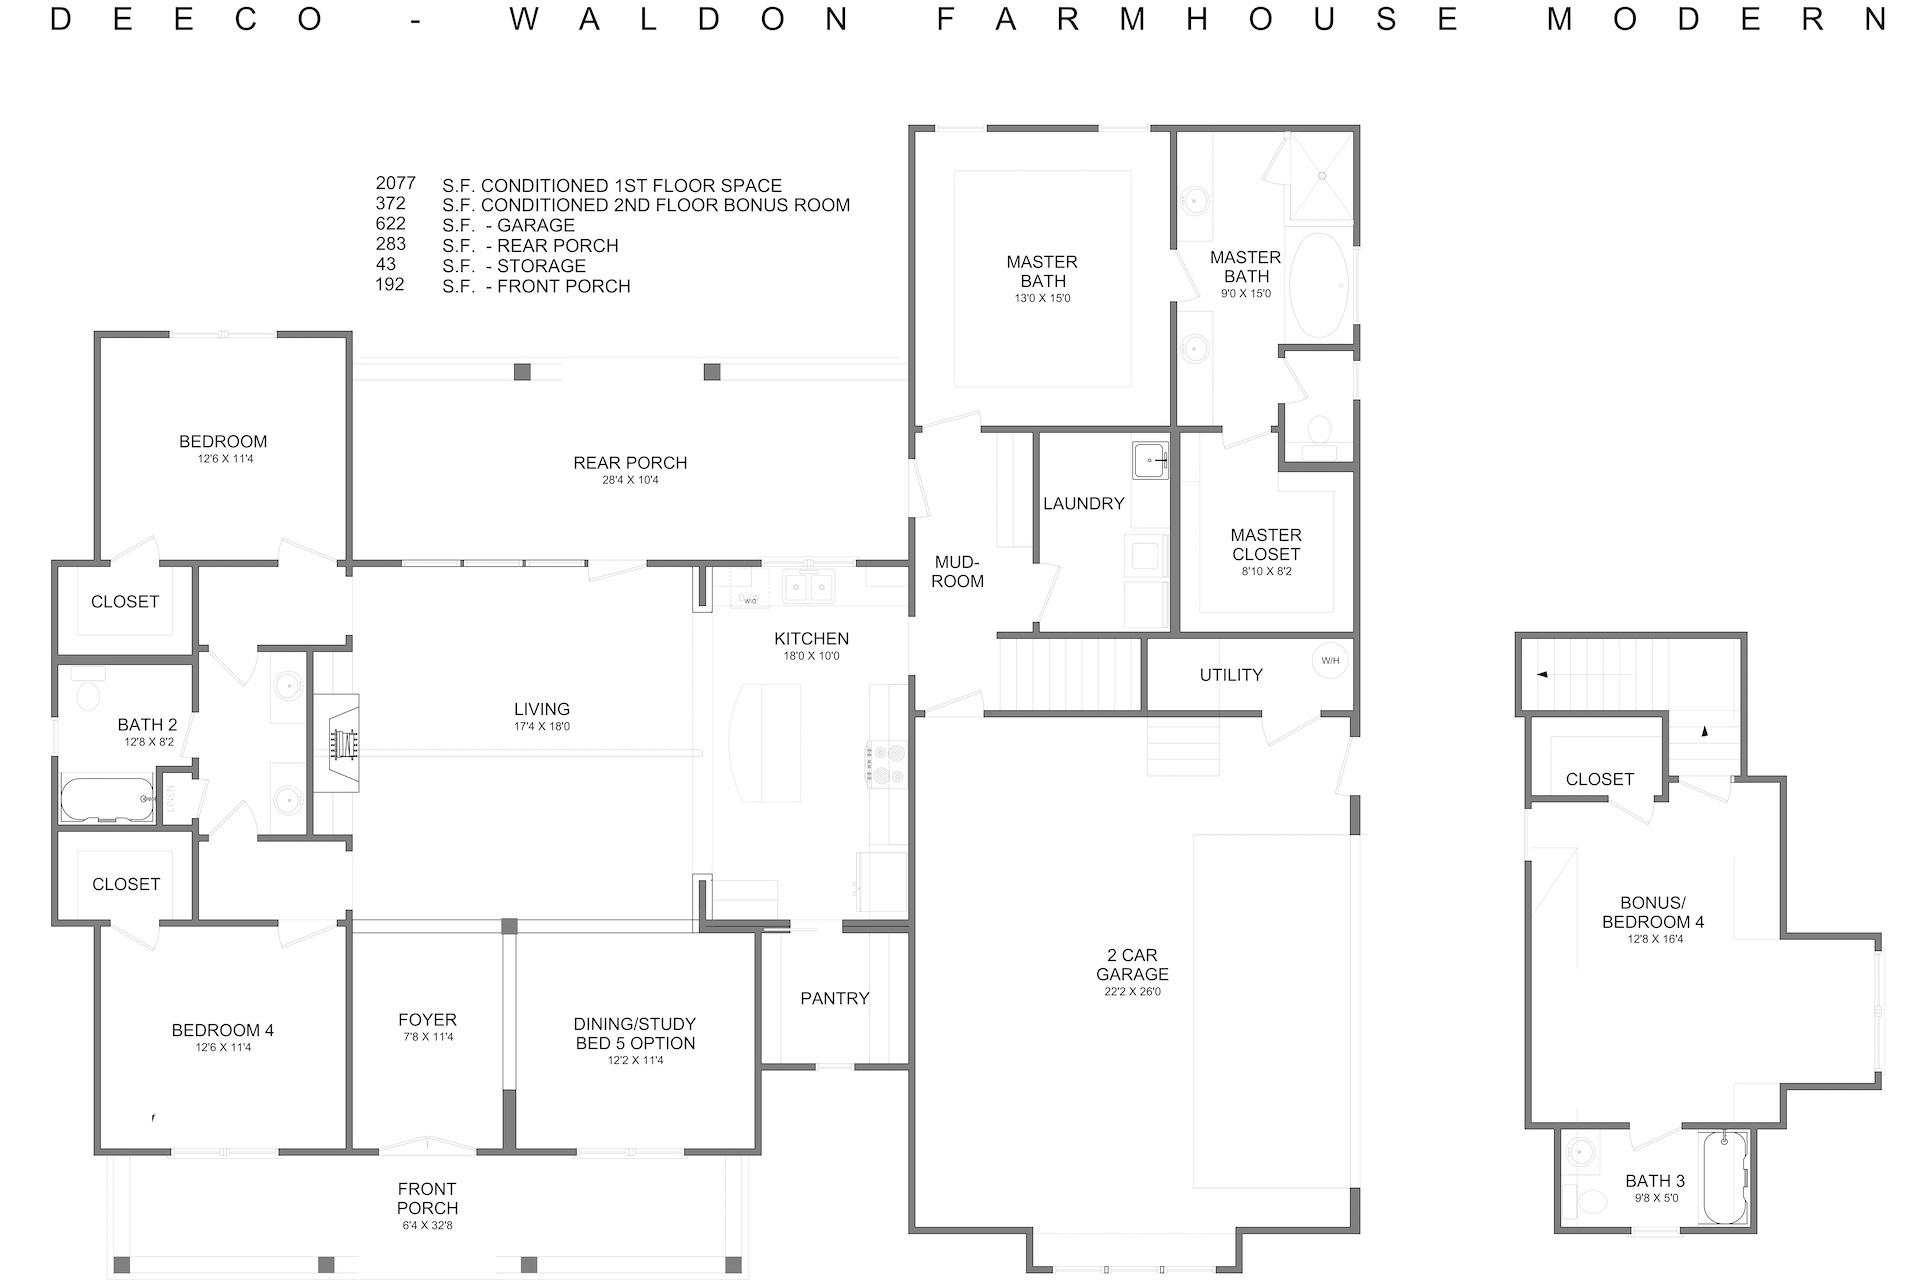 WALDON_FARMHOUSE_MODERN_MARKETING_PLAN.jpg